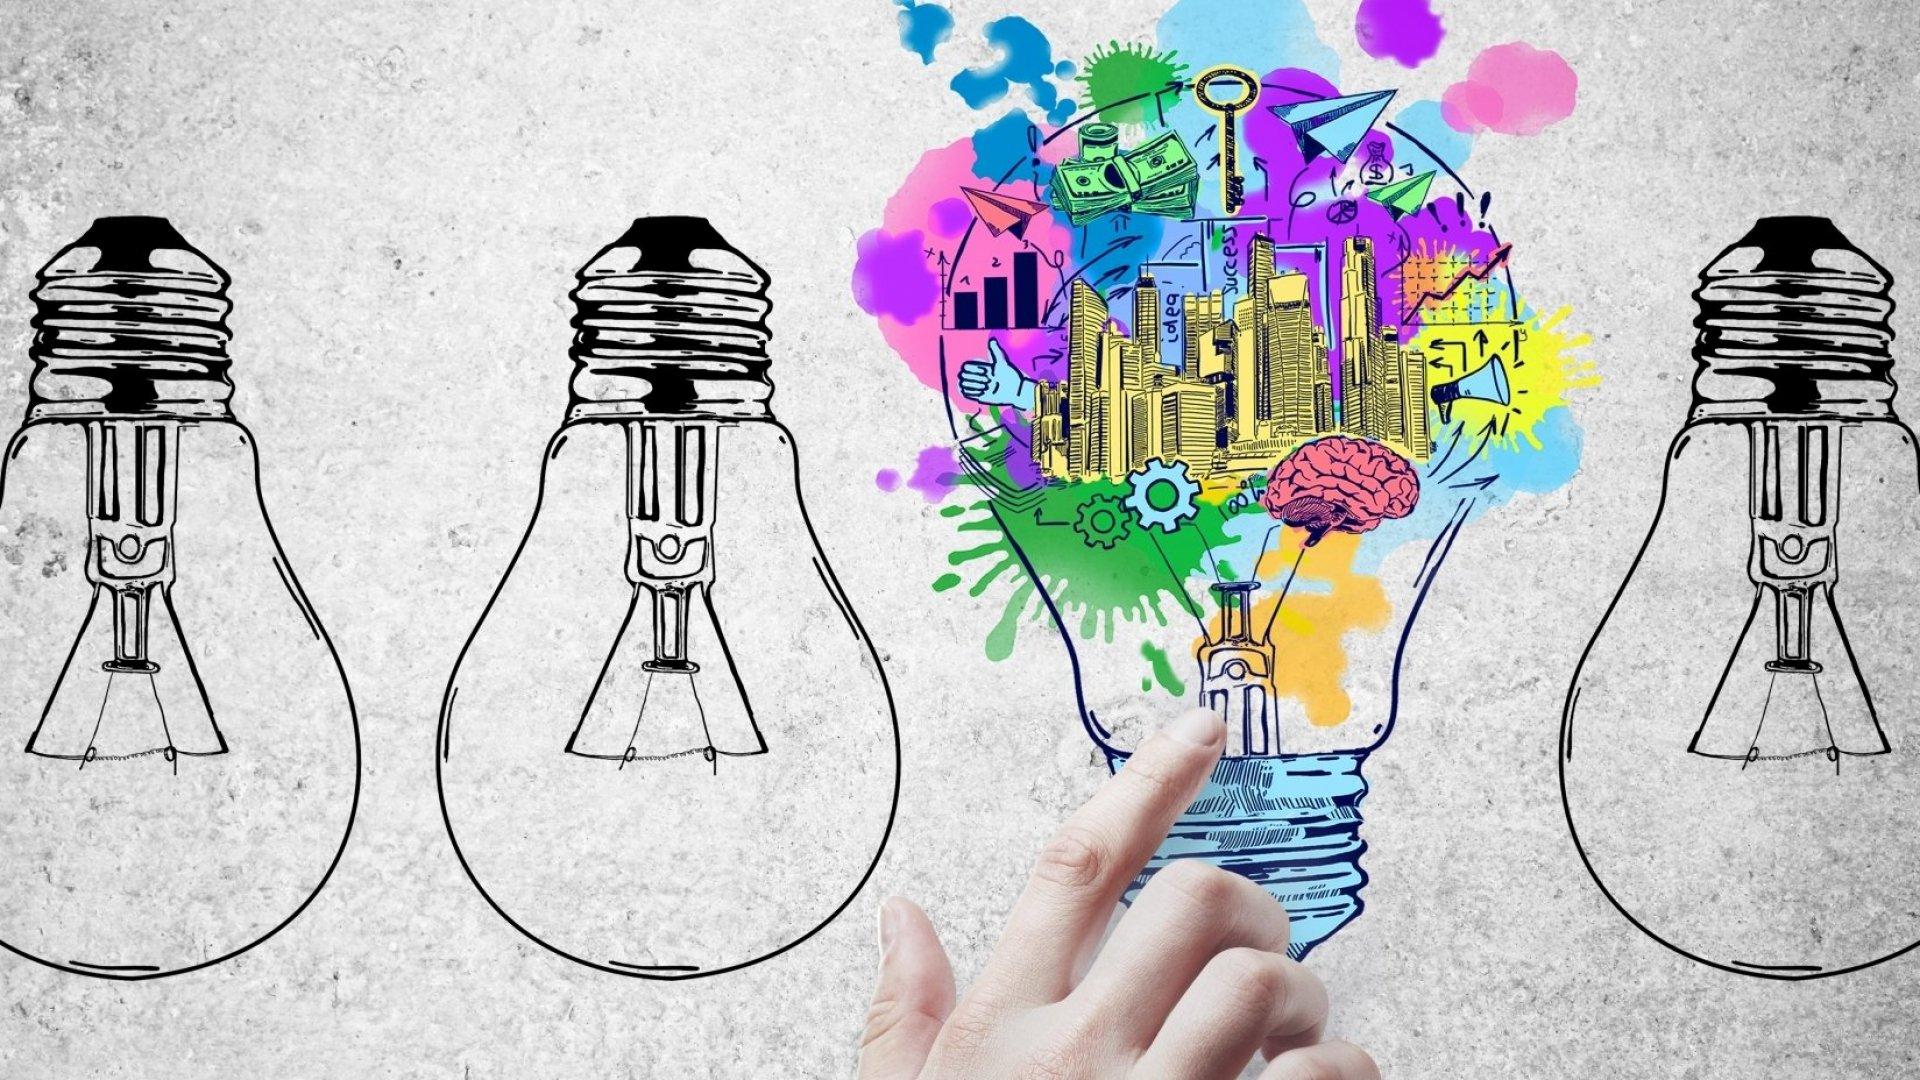 20 Smart Tips That Will Make You a Better Entrepreneur